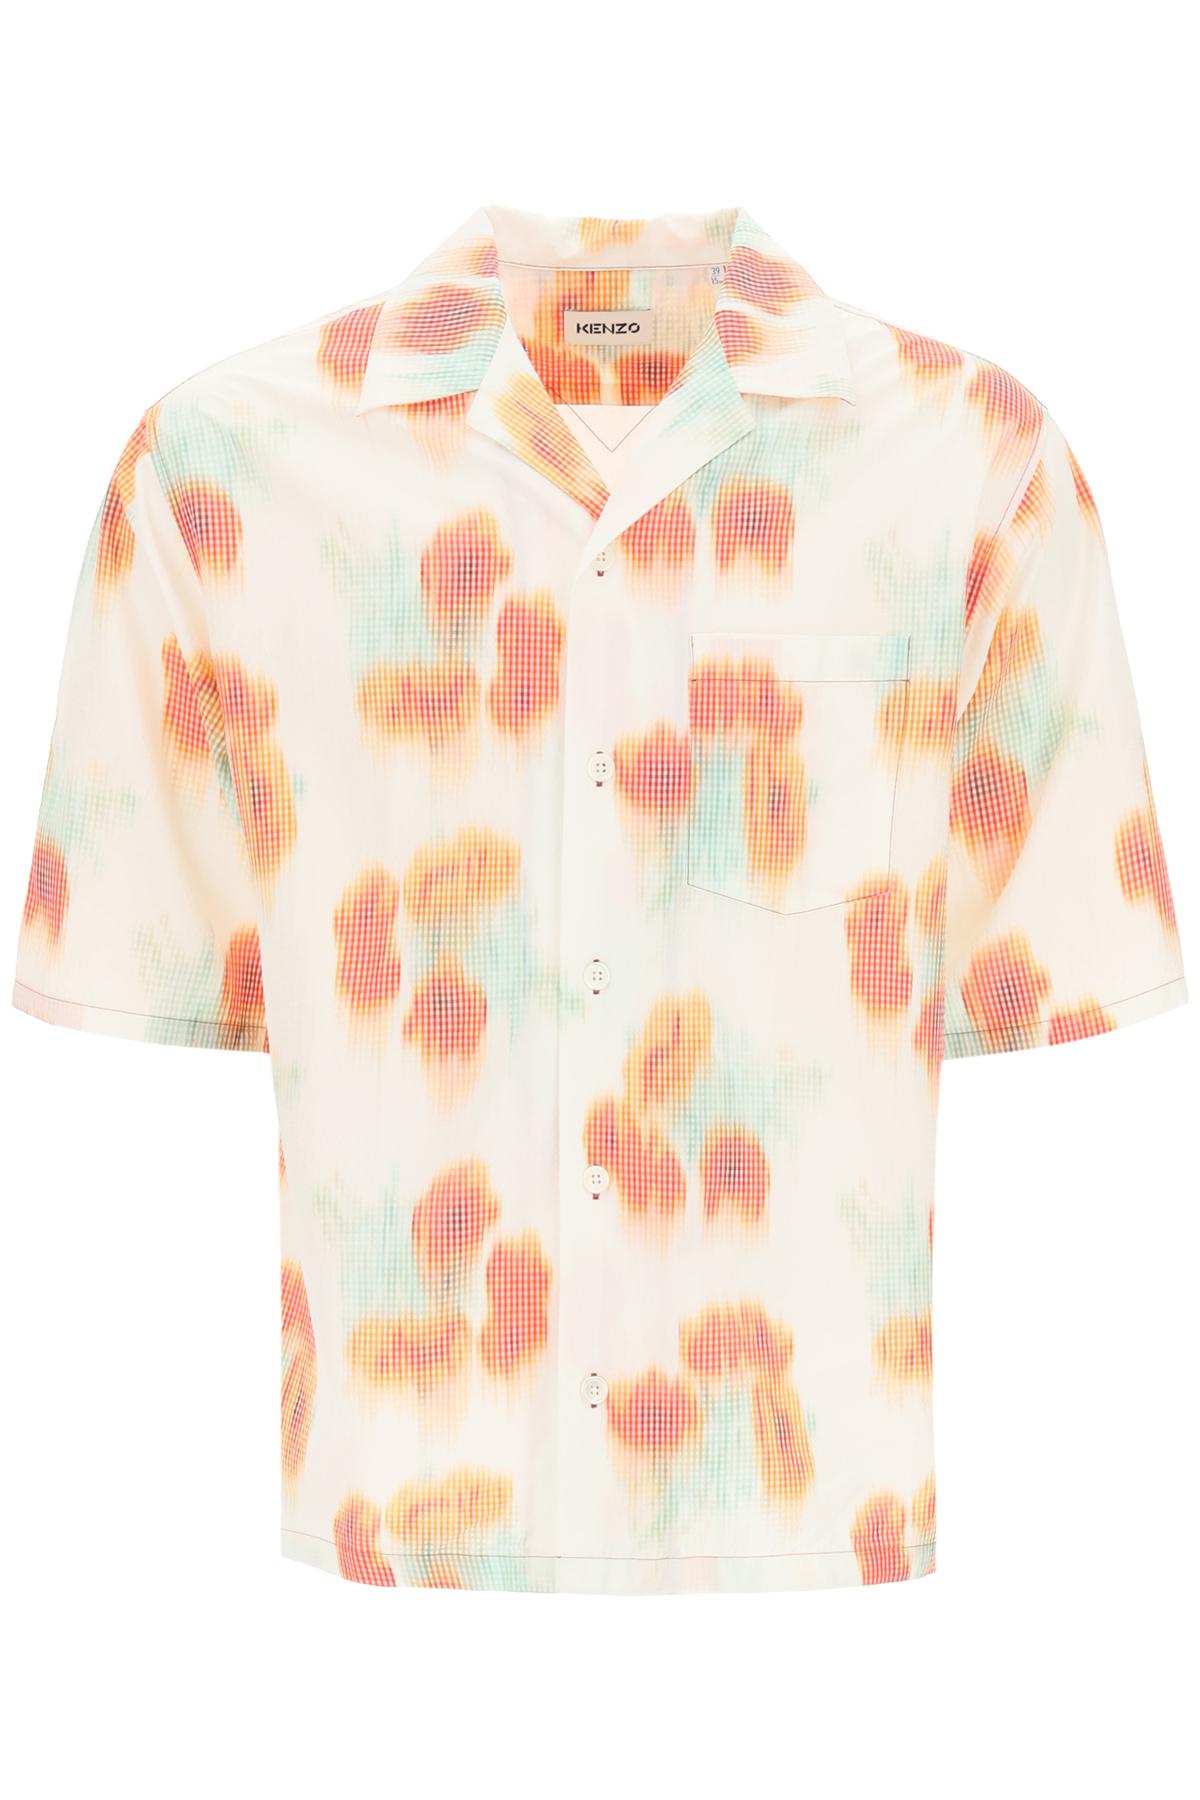 Kenzo camicia hawaiian stampa coquelicots